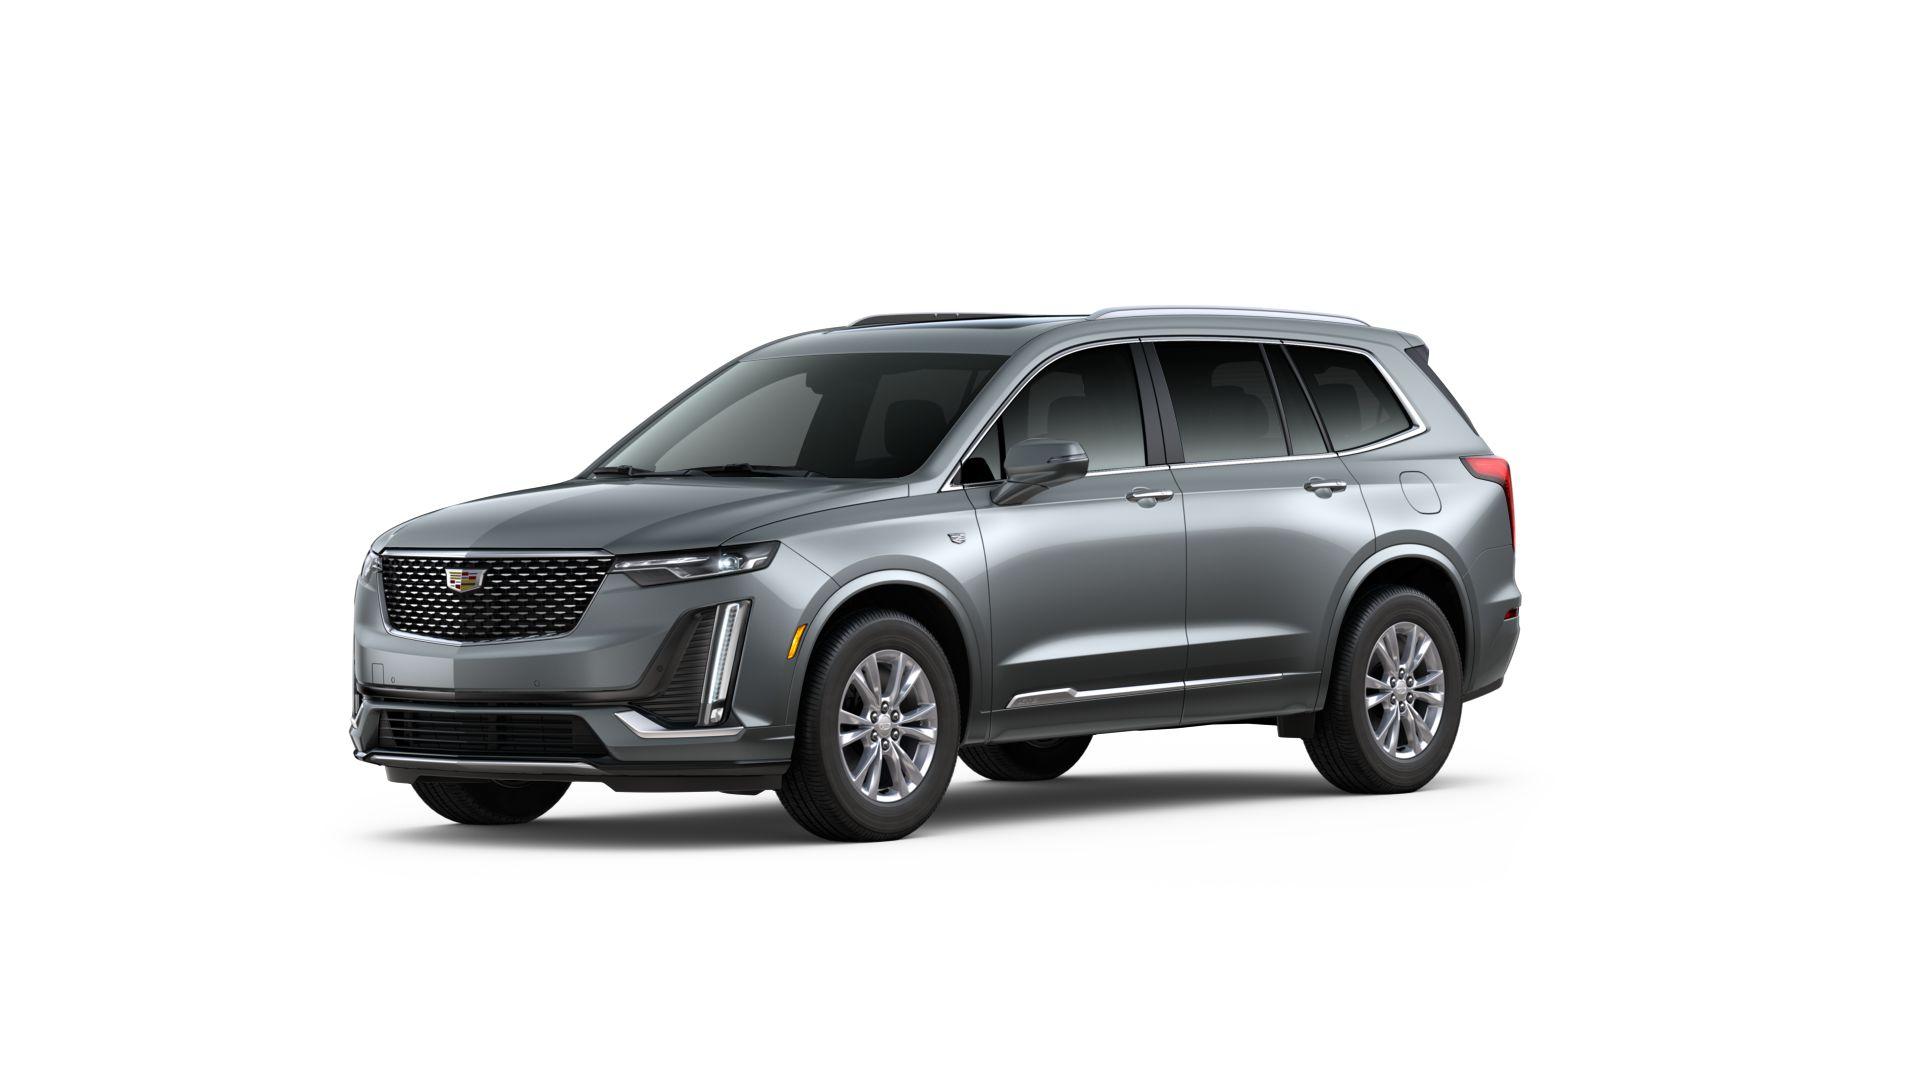 2021 Cadillac XT6 Luxury